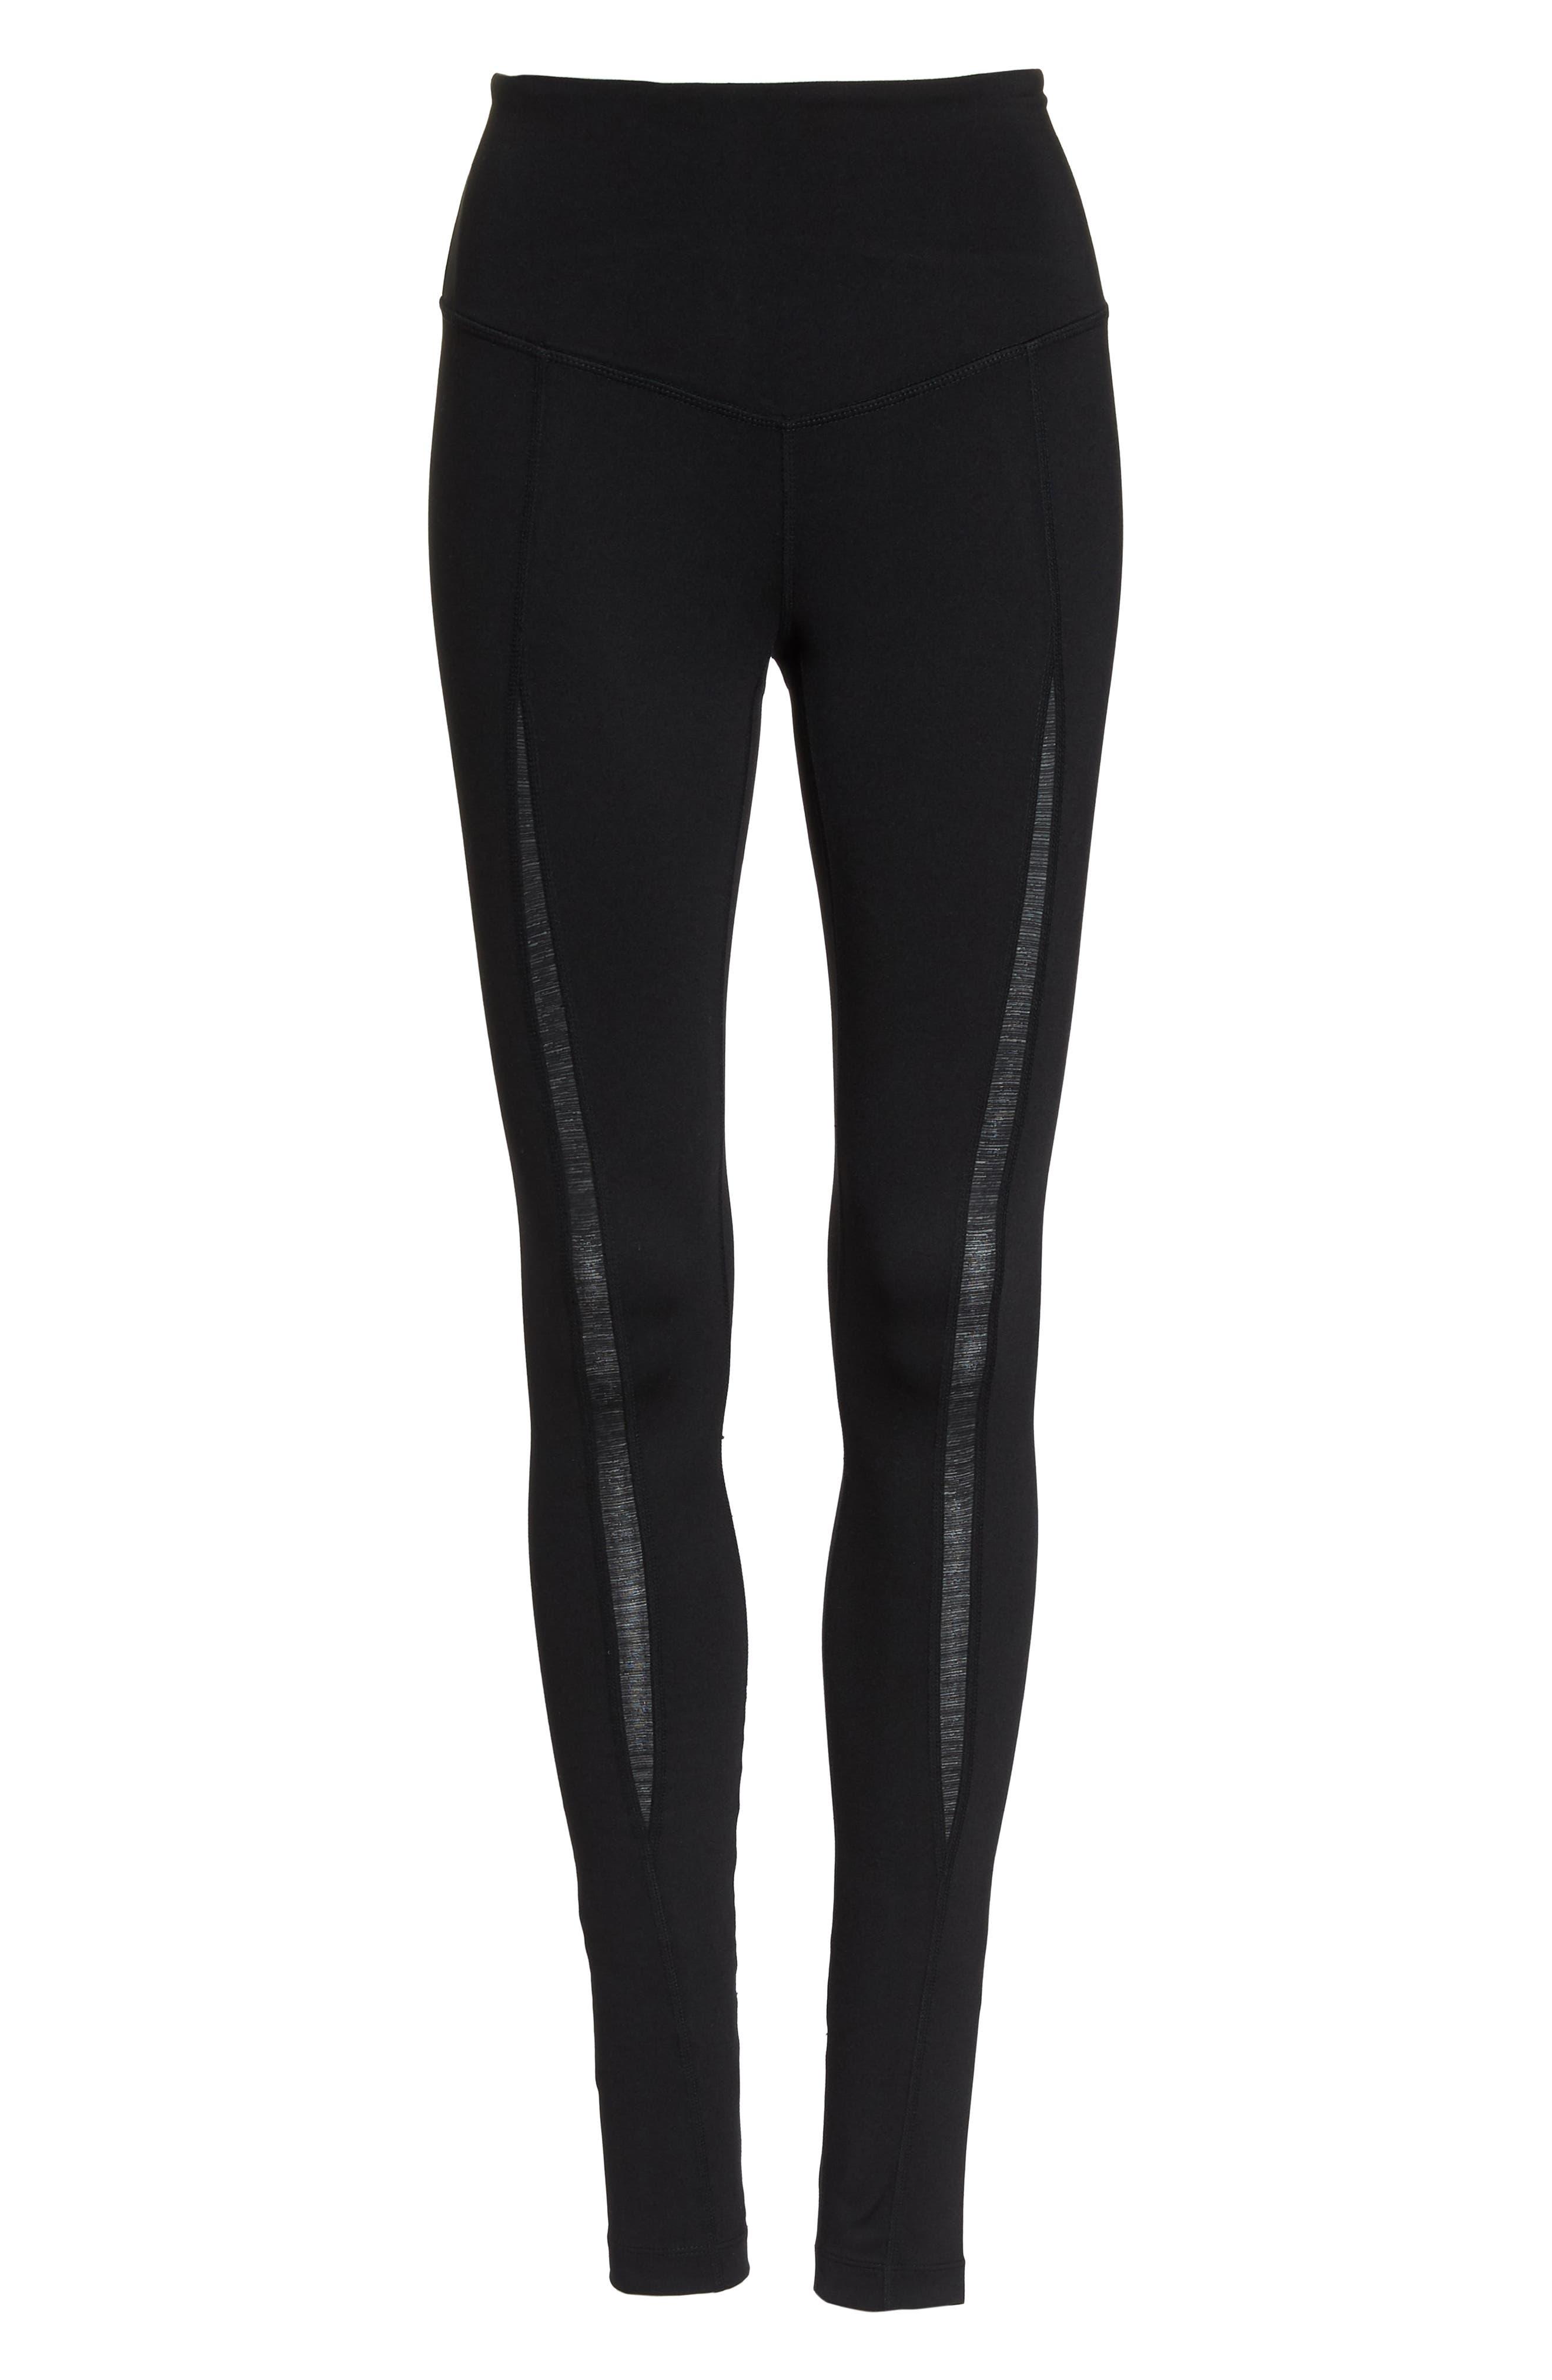 Reinvent Recycled High Waist Leggings,                             Alternate thumbnail 7, color,                             BLACK